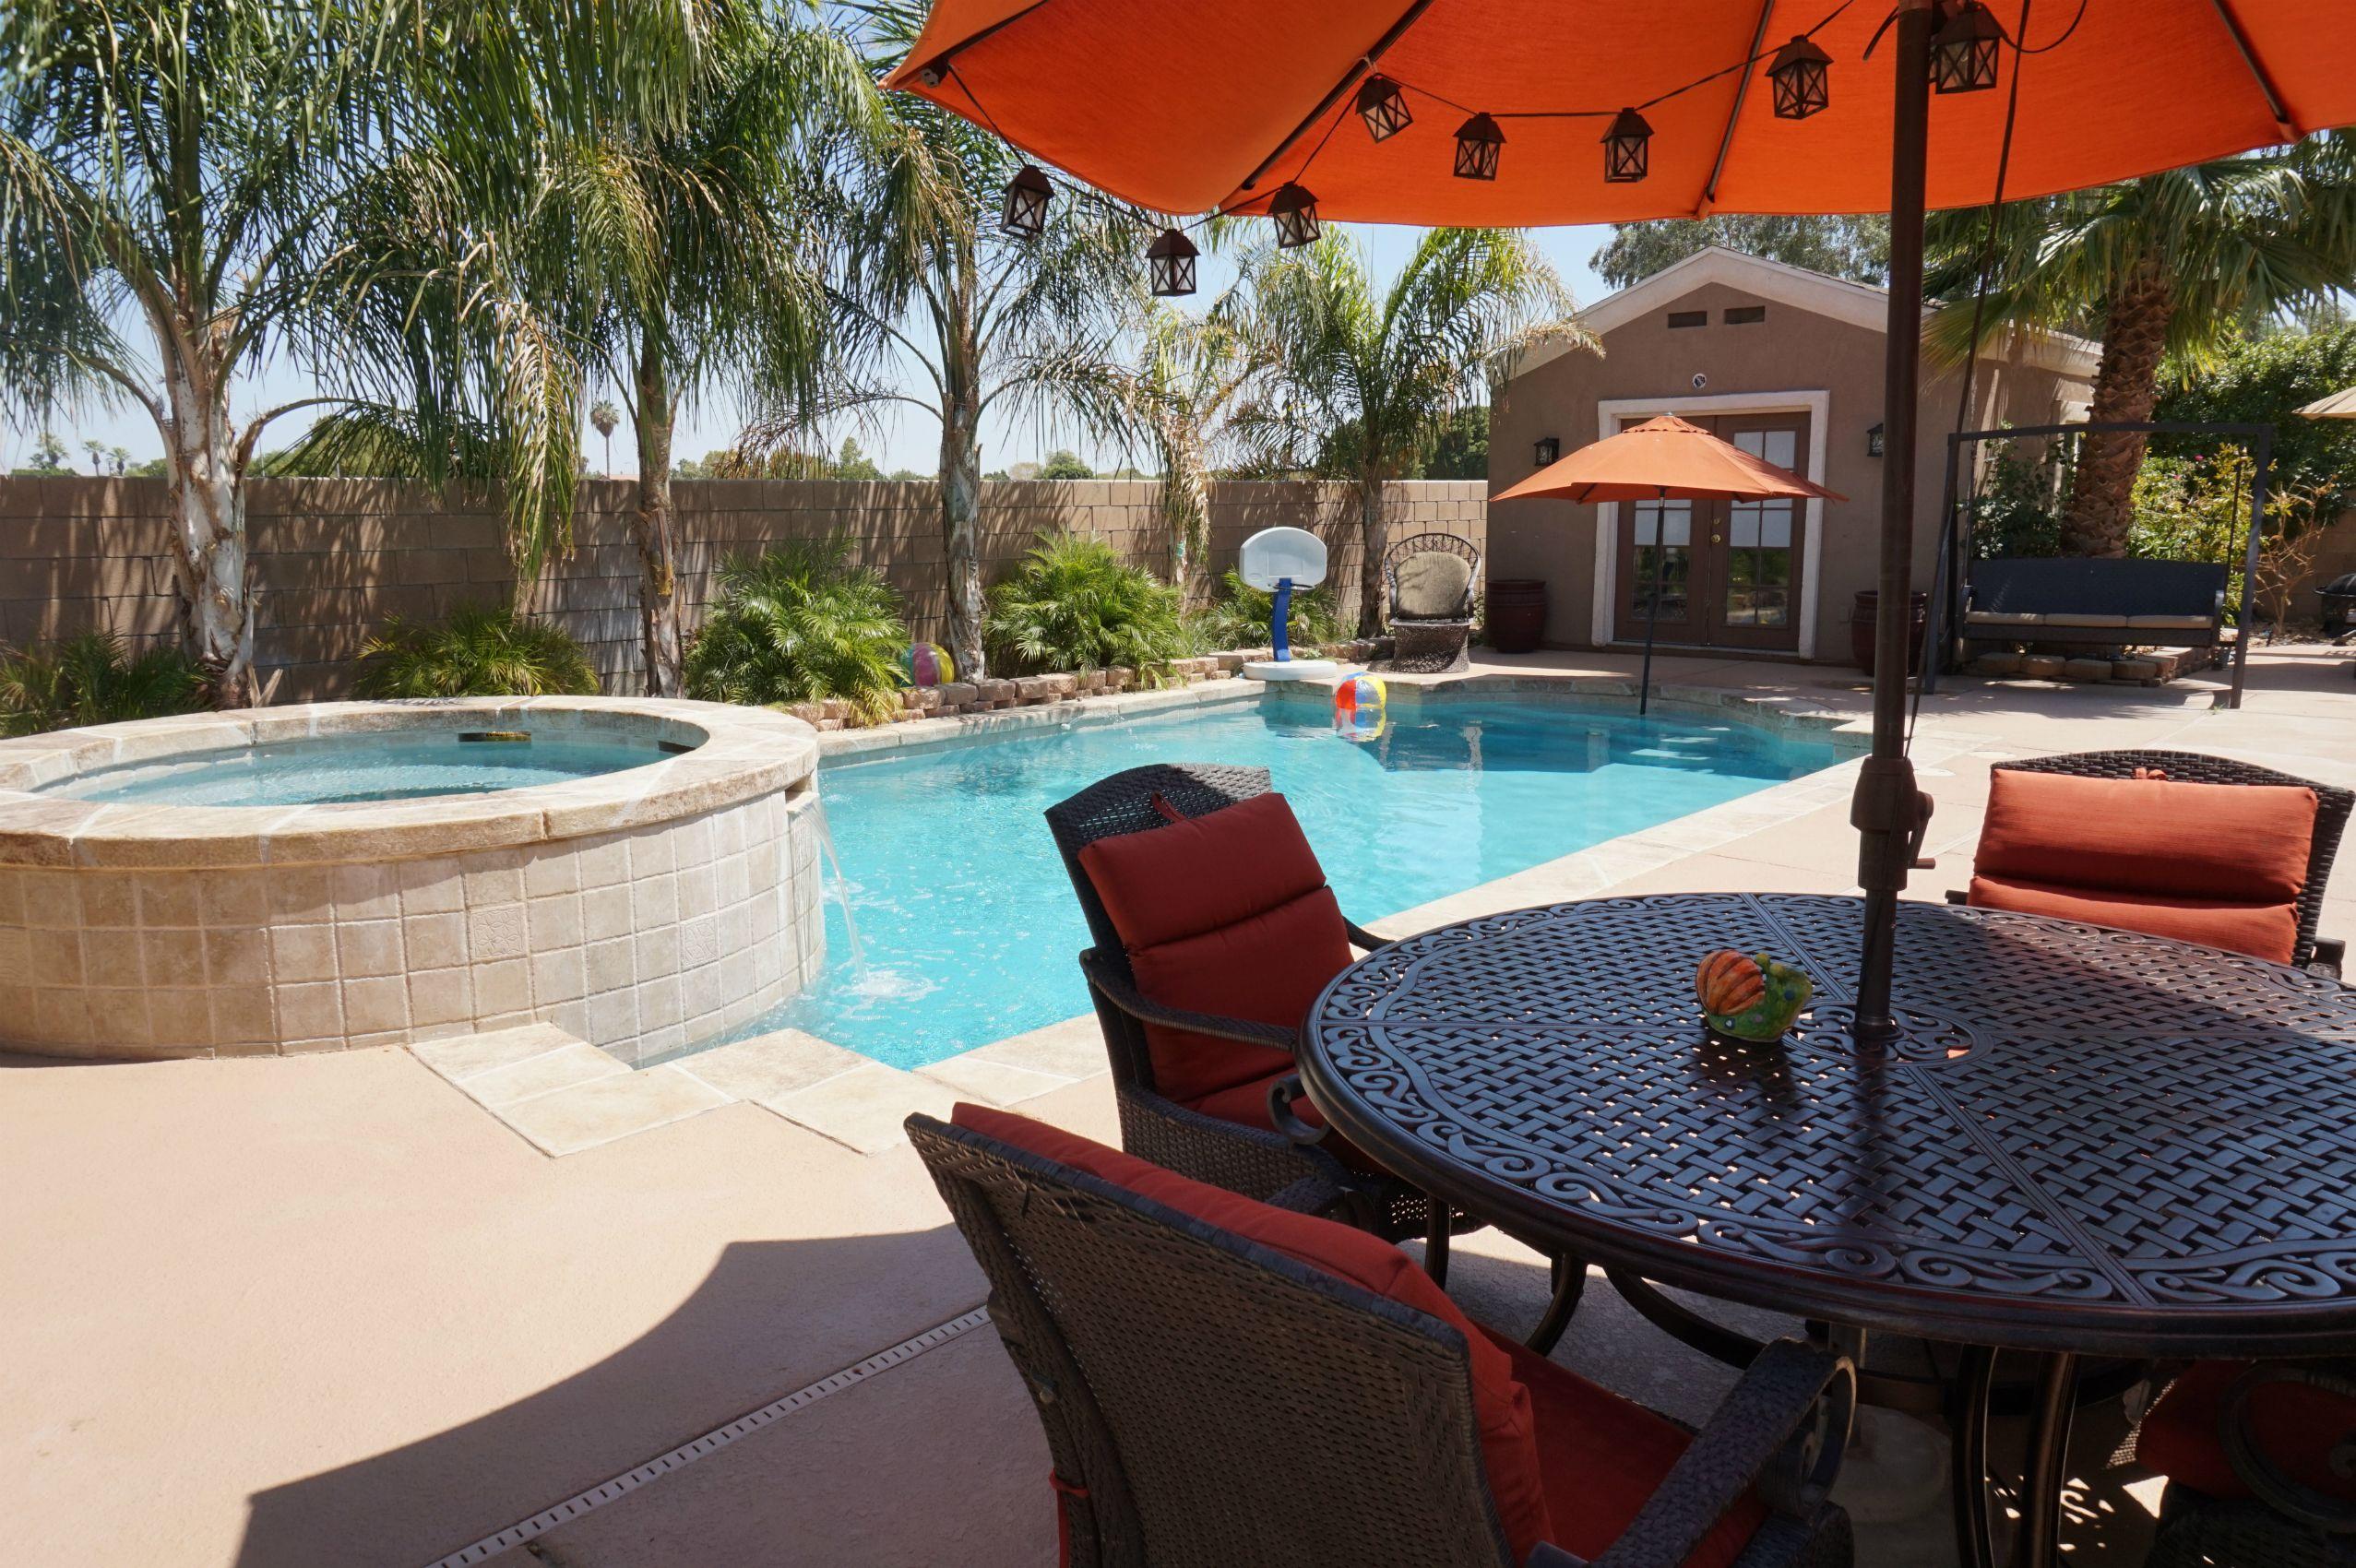 Pool Home For Sale In Indio Ca Backyard Pool Backyard Palm Desert